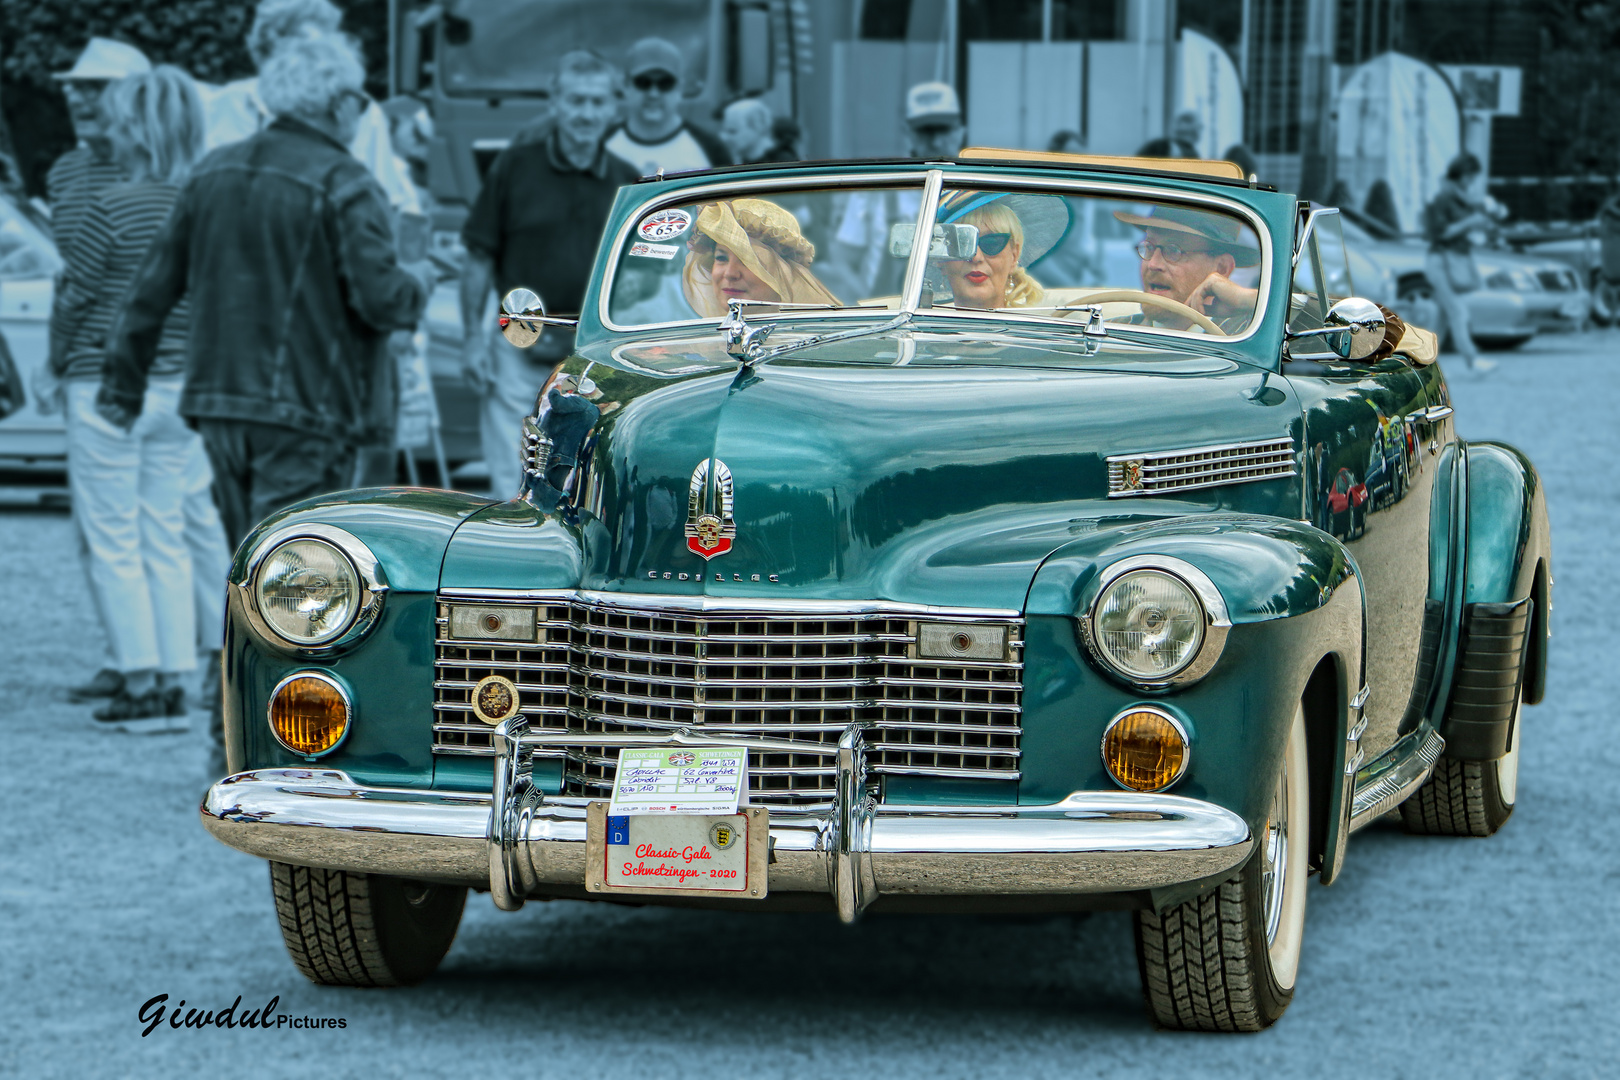 Cadillac 62 Convertible Cabriolet (BJ 1941) - final